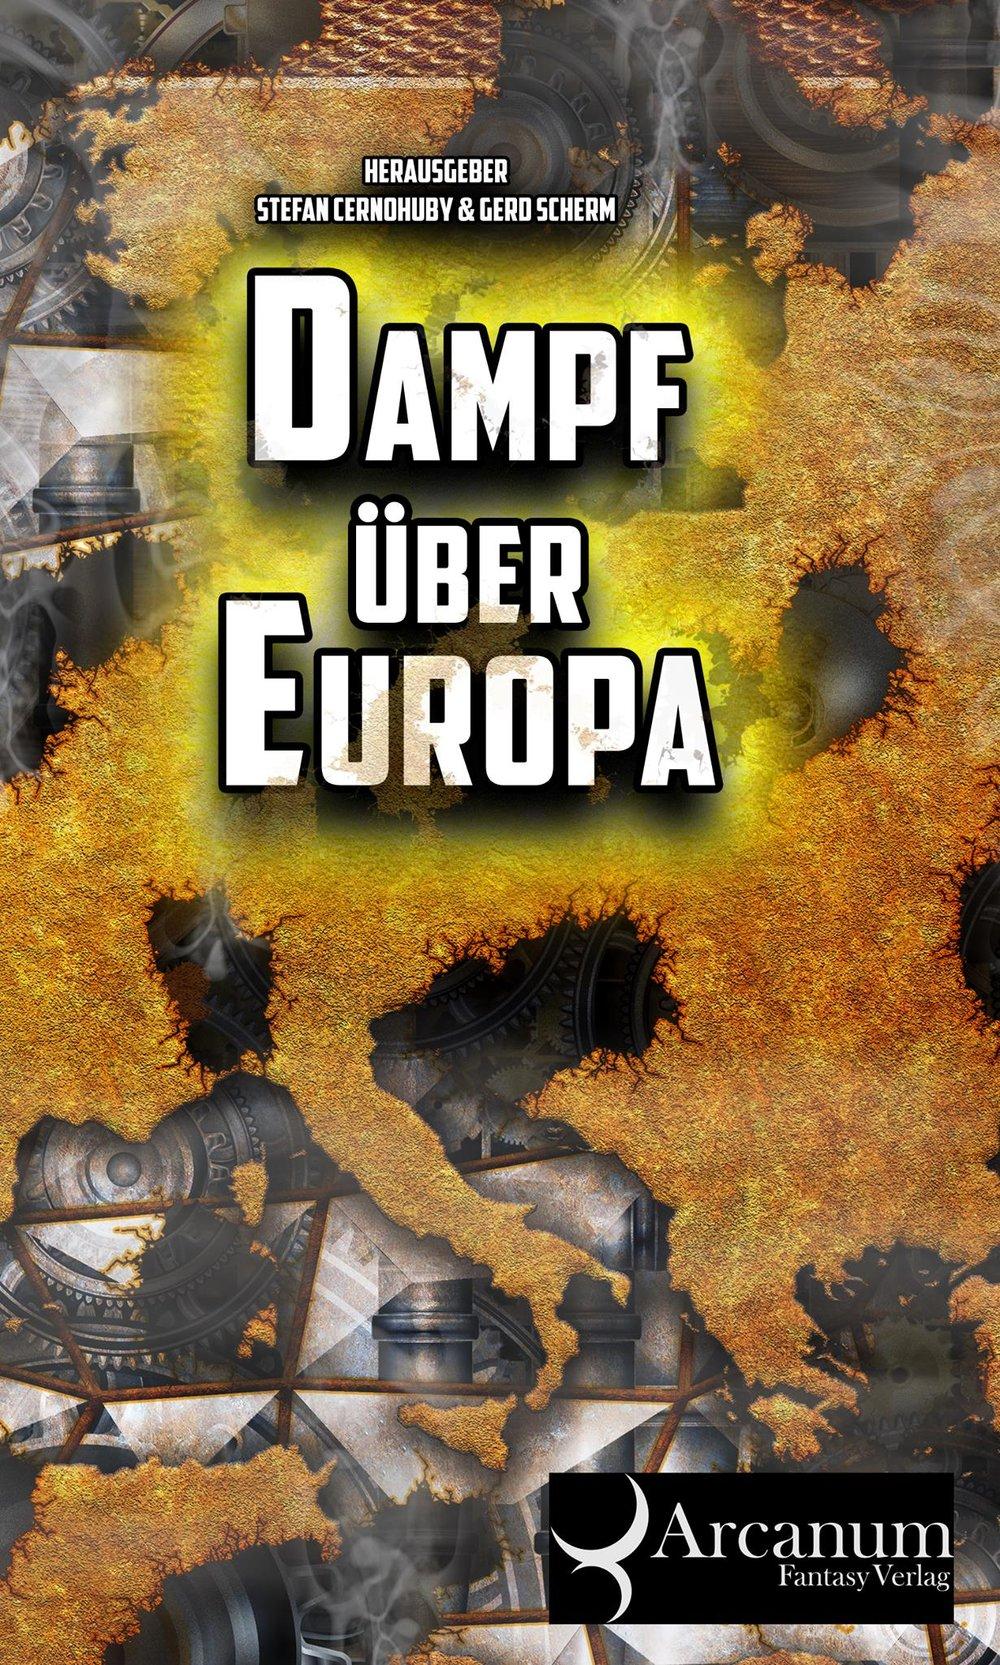 Dampf-ueber-Europa.jpg